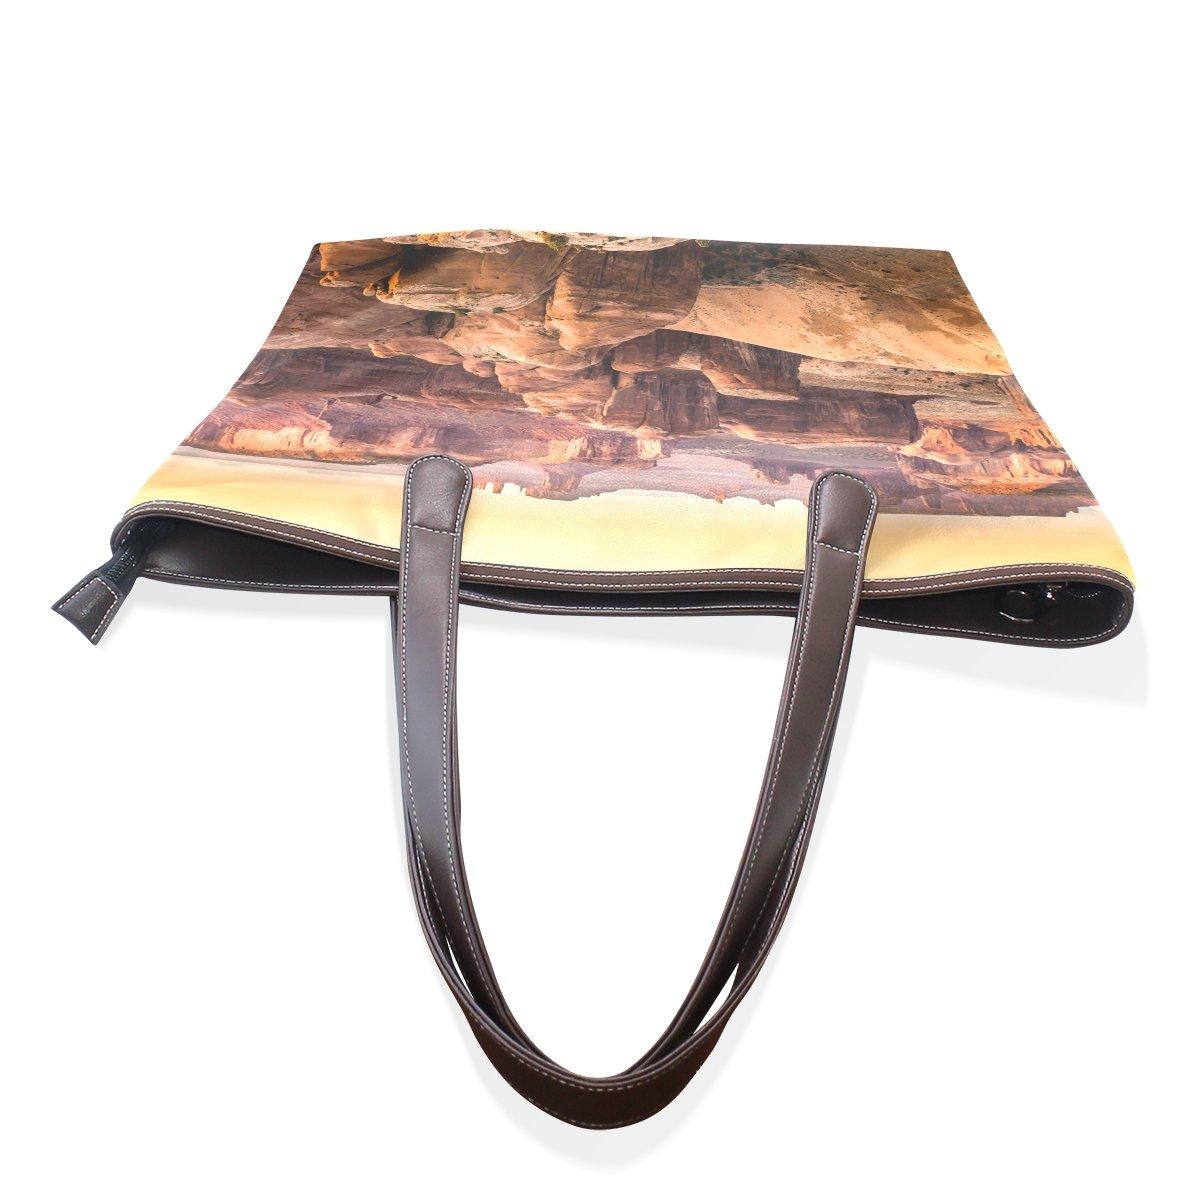 SCDS Brown Canyon PU Leather Lady Handbag Tote Bag Zipper Shoulder Bag